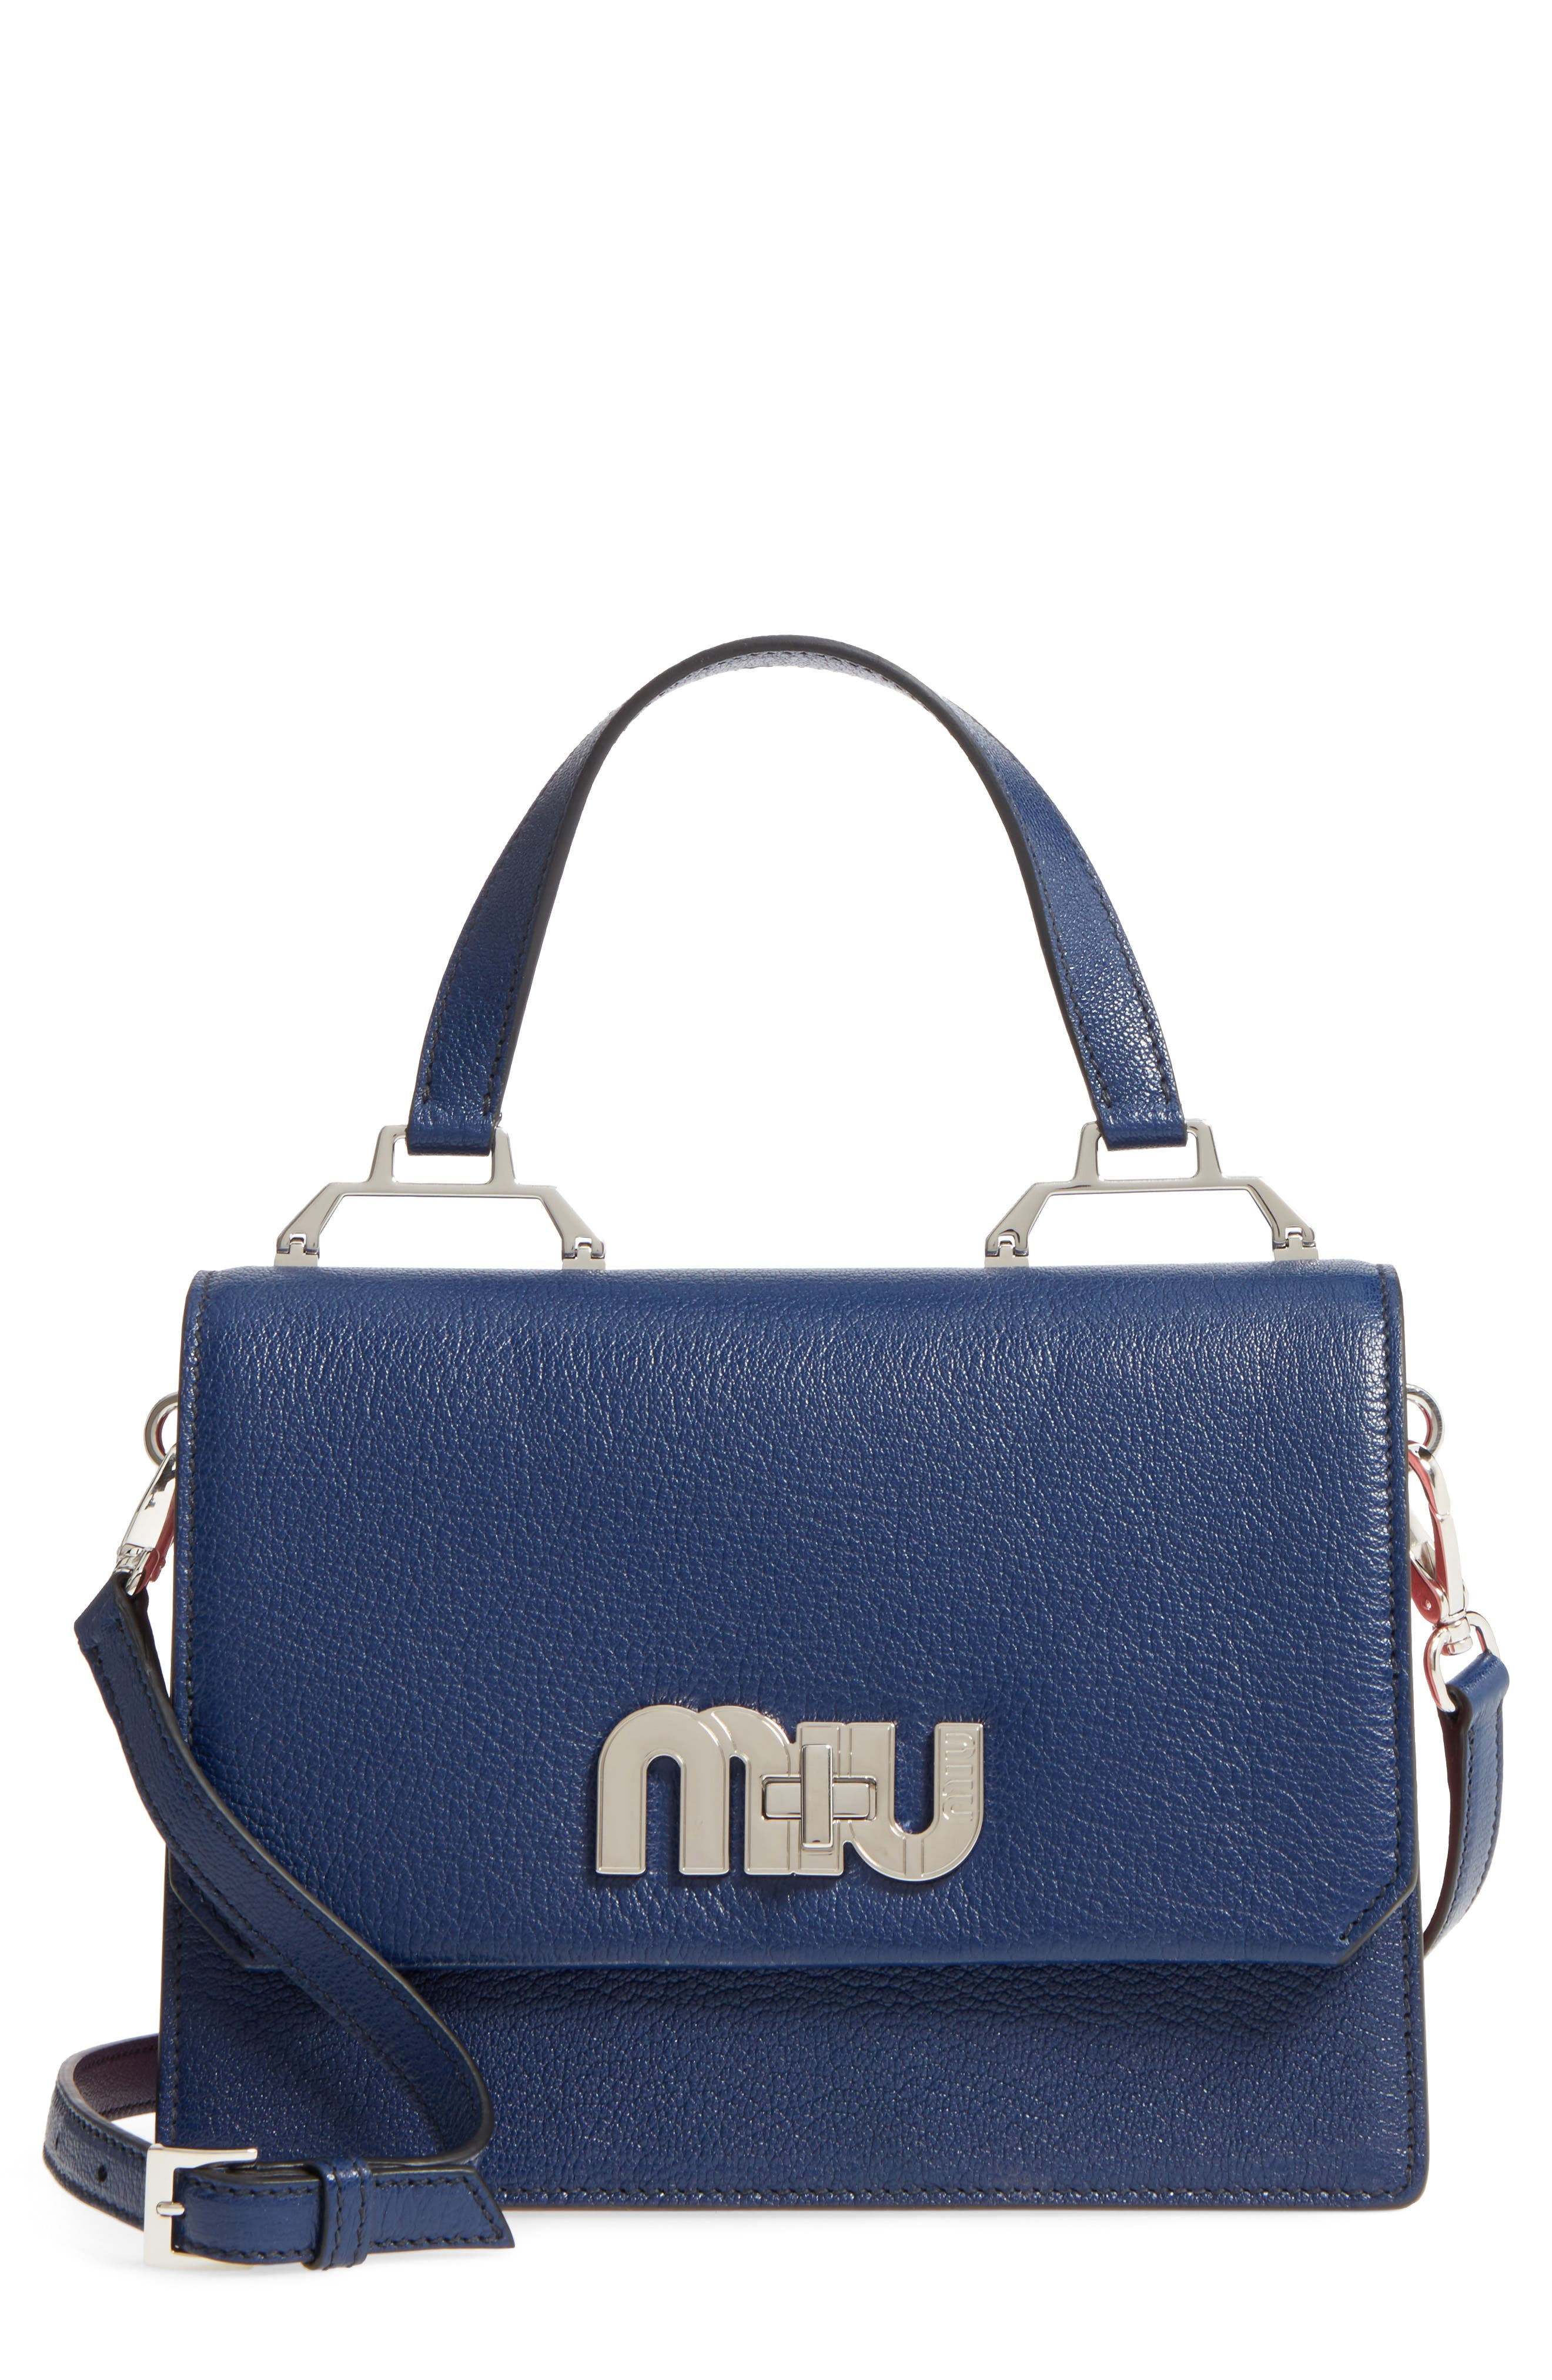 Miu Miu Small Logo Leather Satchel